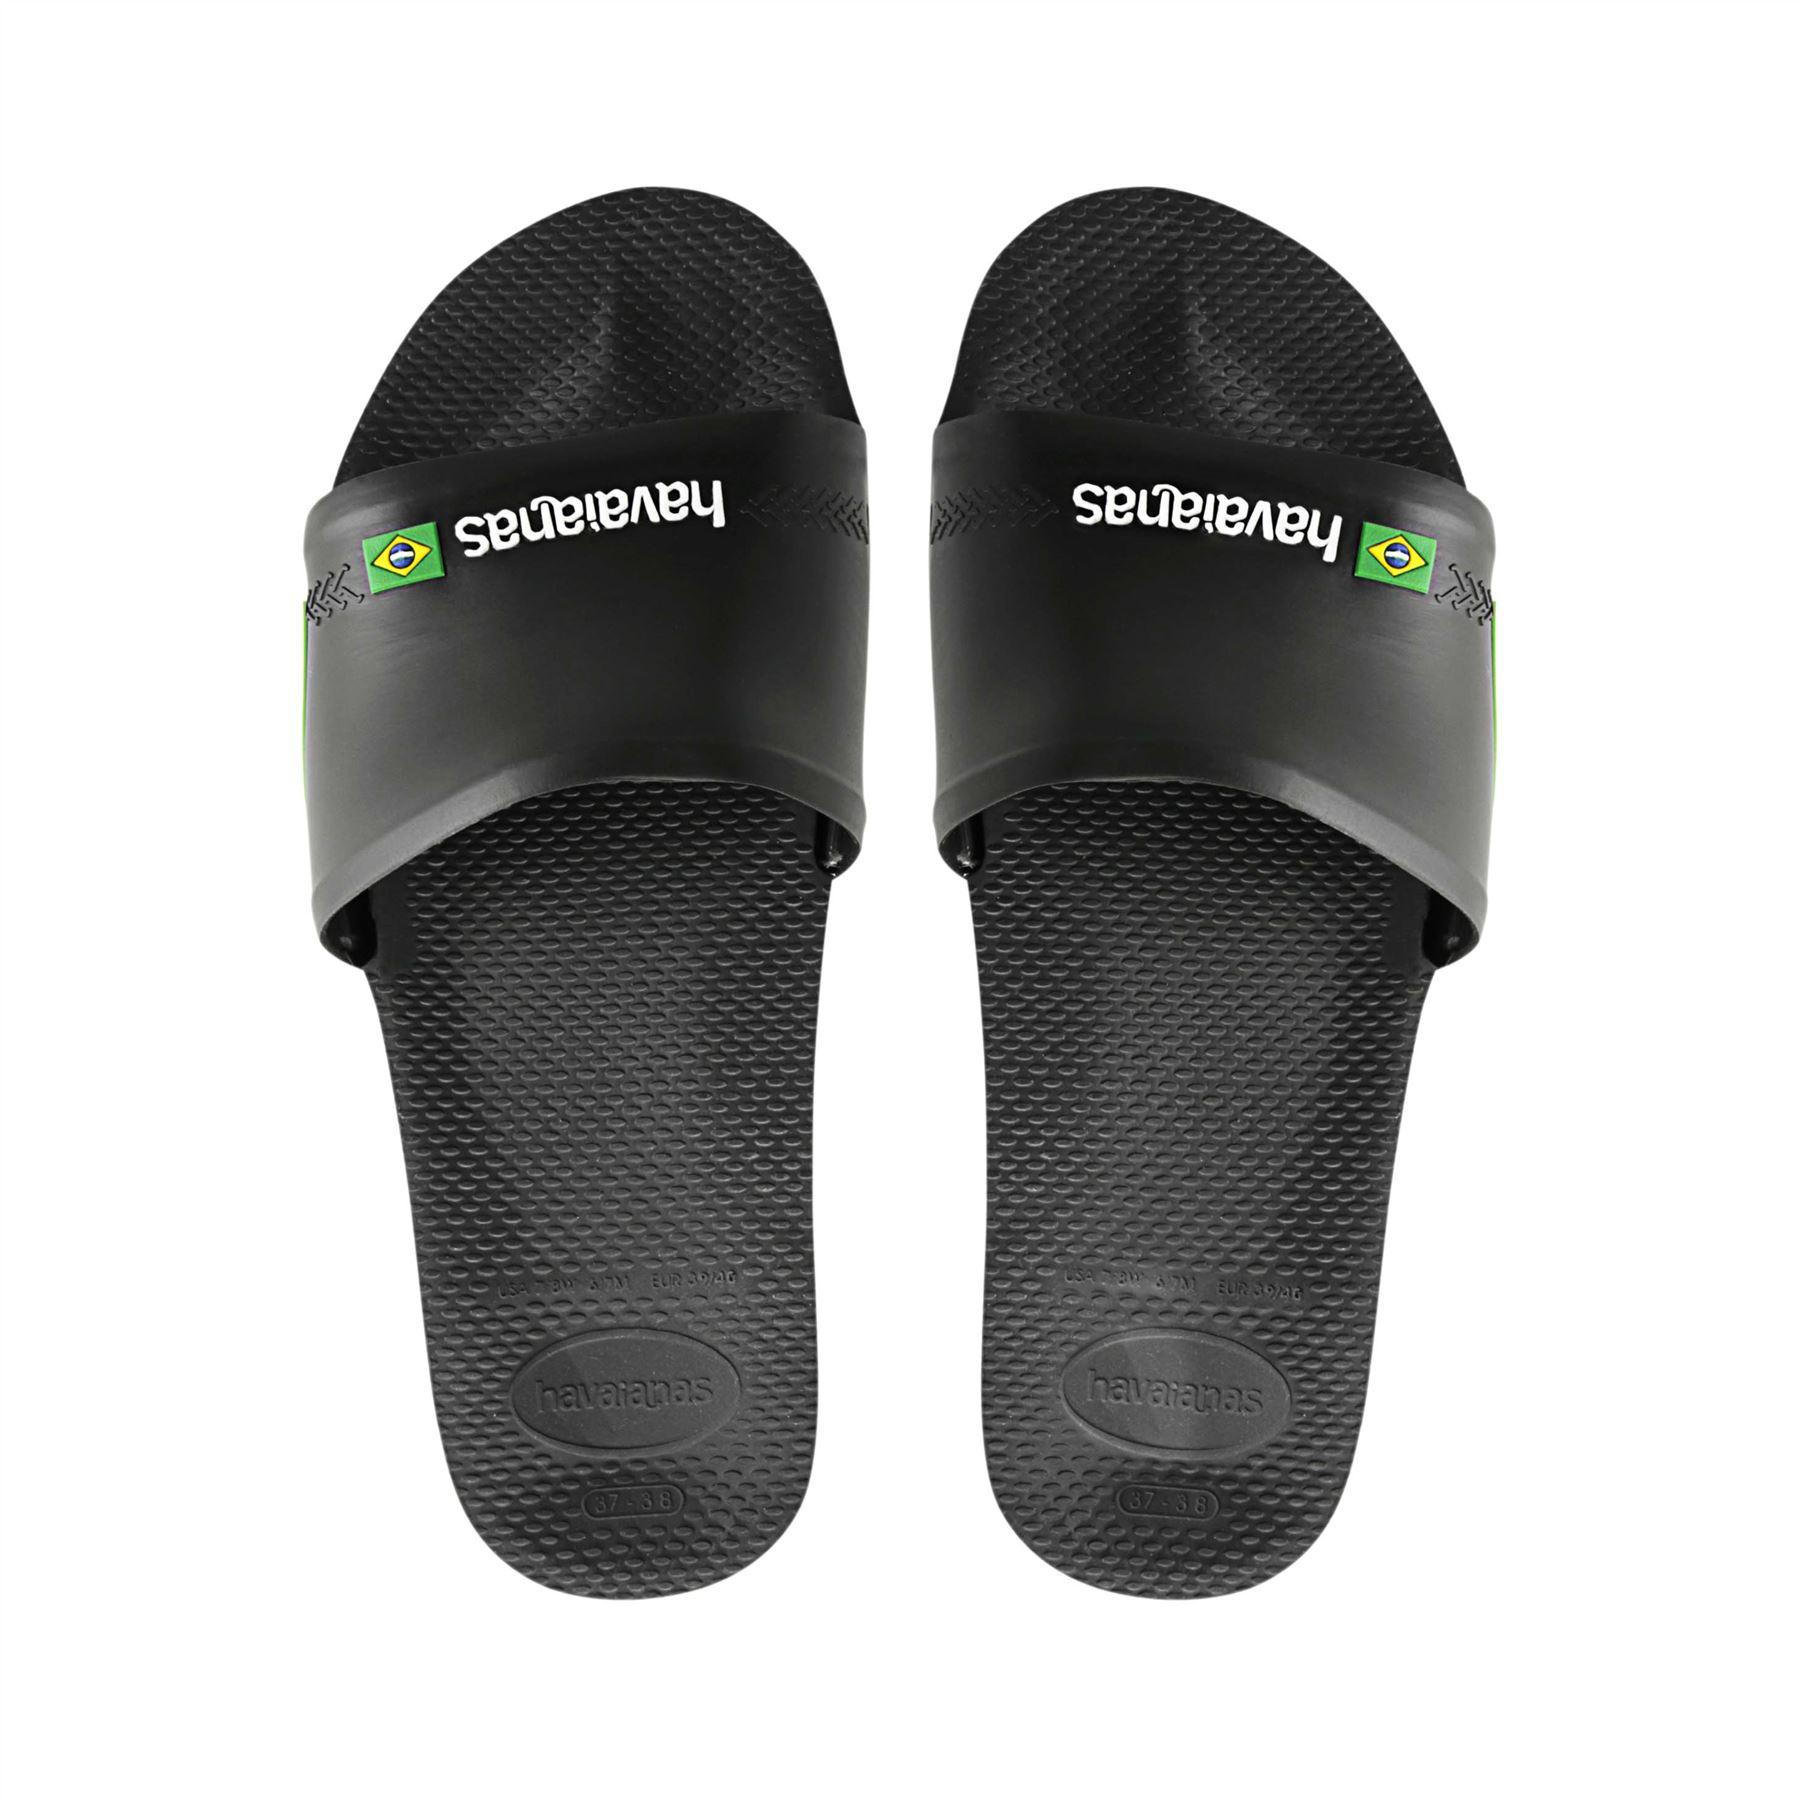 Details zu Havaianas Slide Brasil Dual Tone Summer Beach Pool Sandals in White, Blue, Black